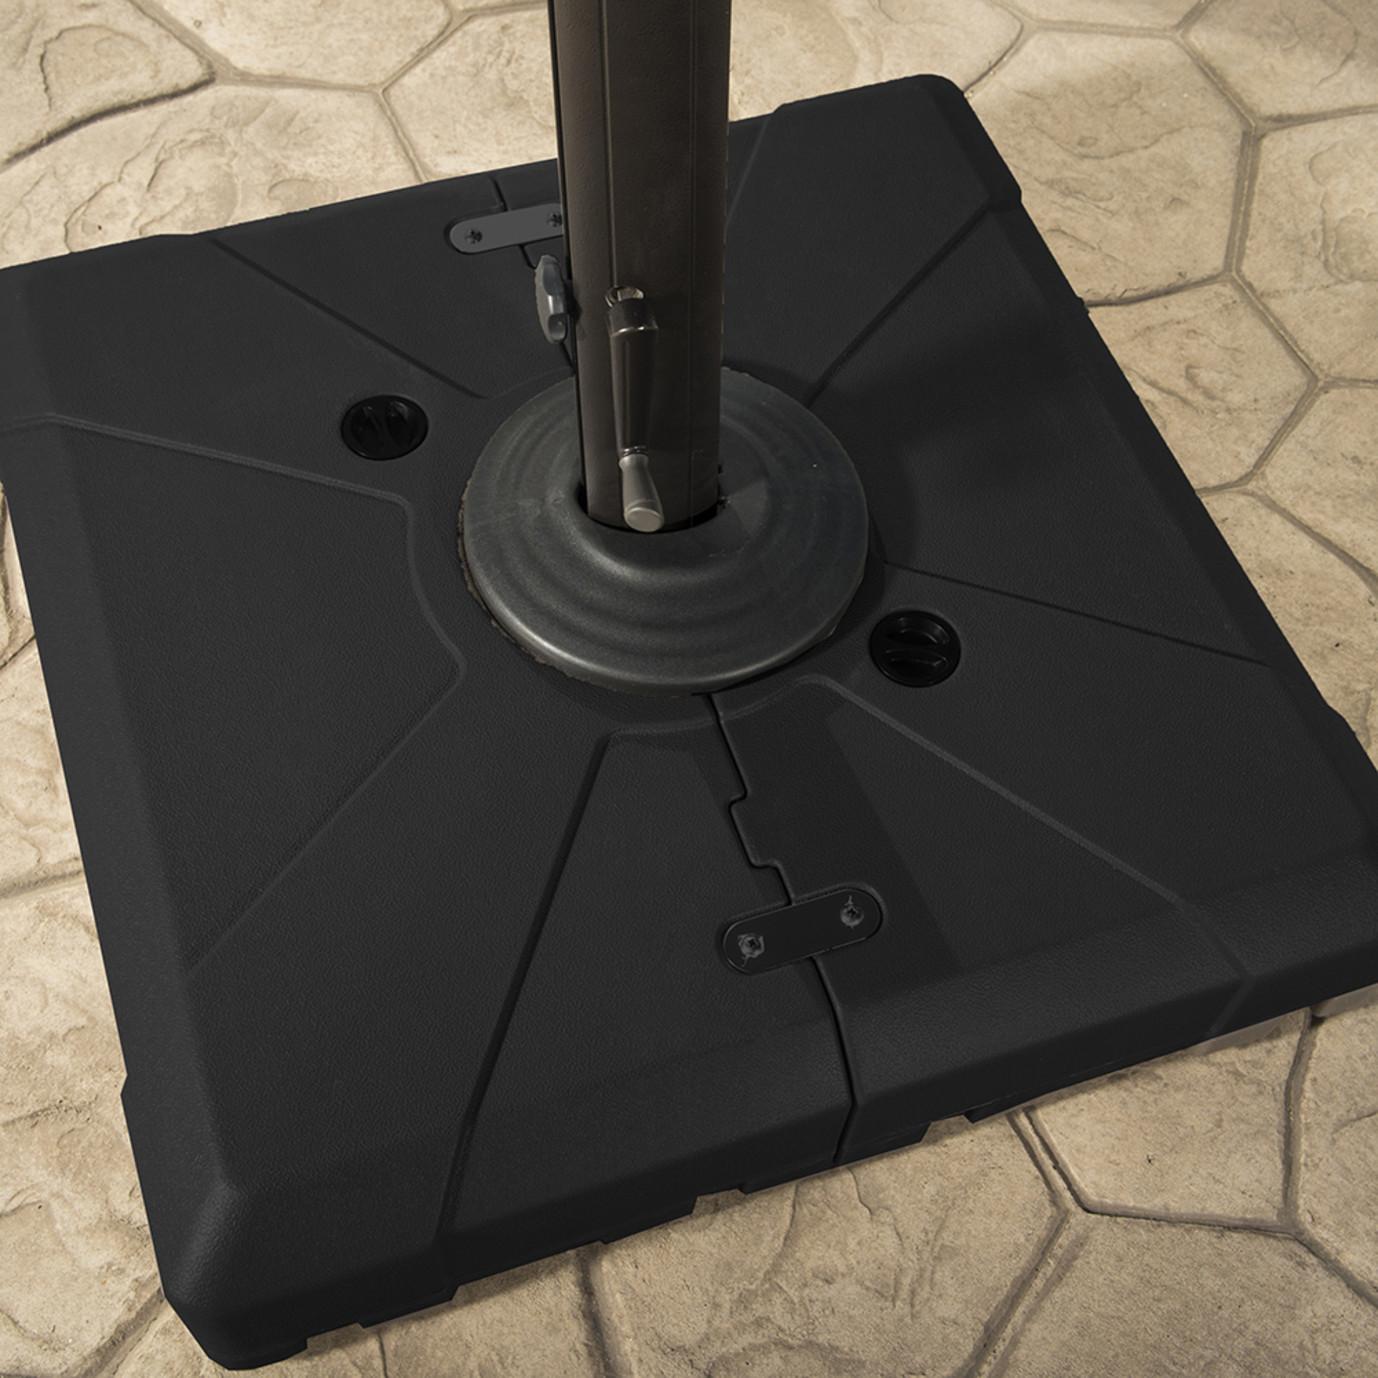 Modular Outdoor 10' Round Umbrella - Charcoal Grey